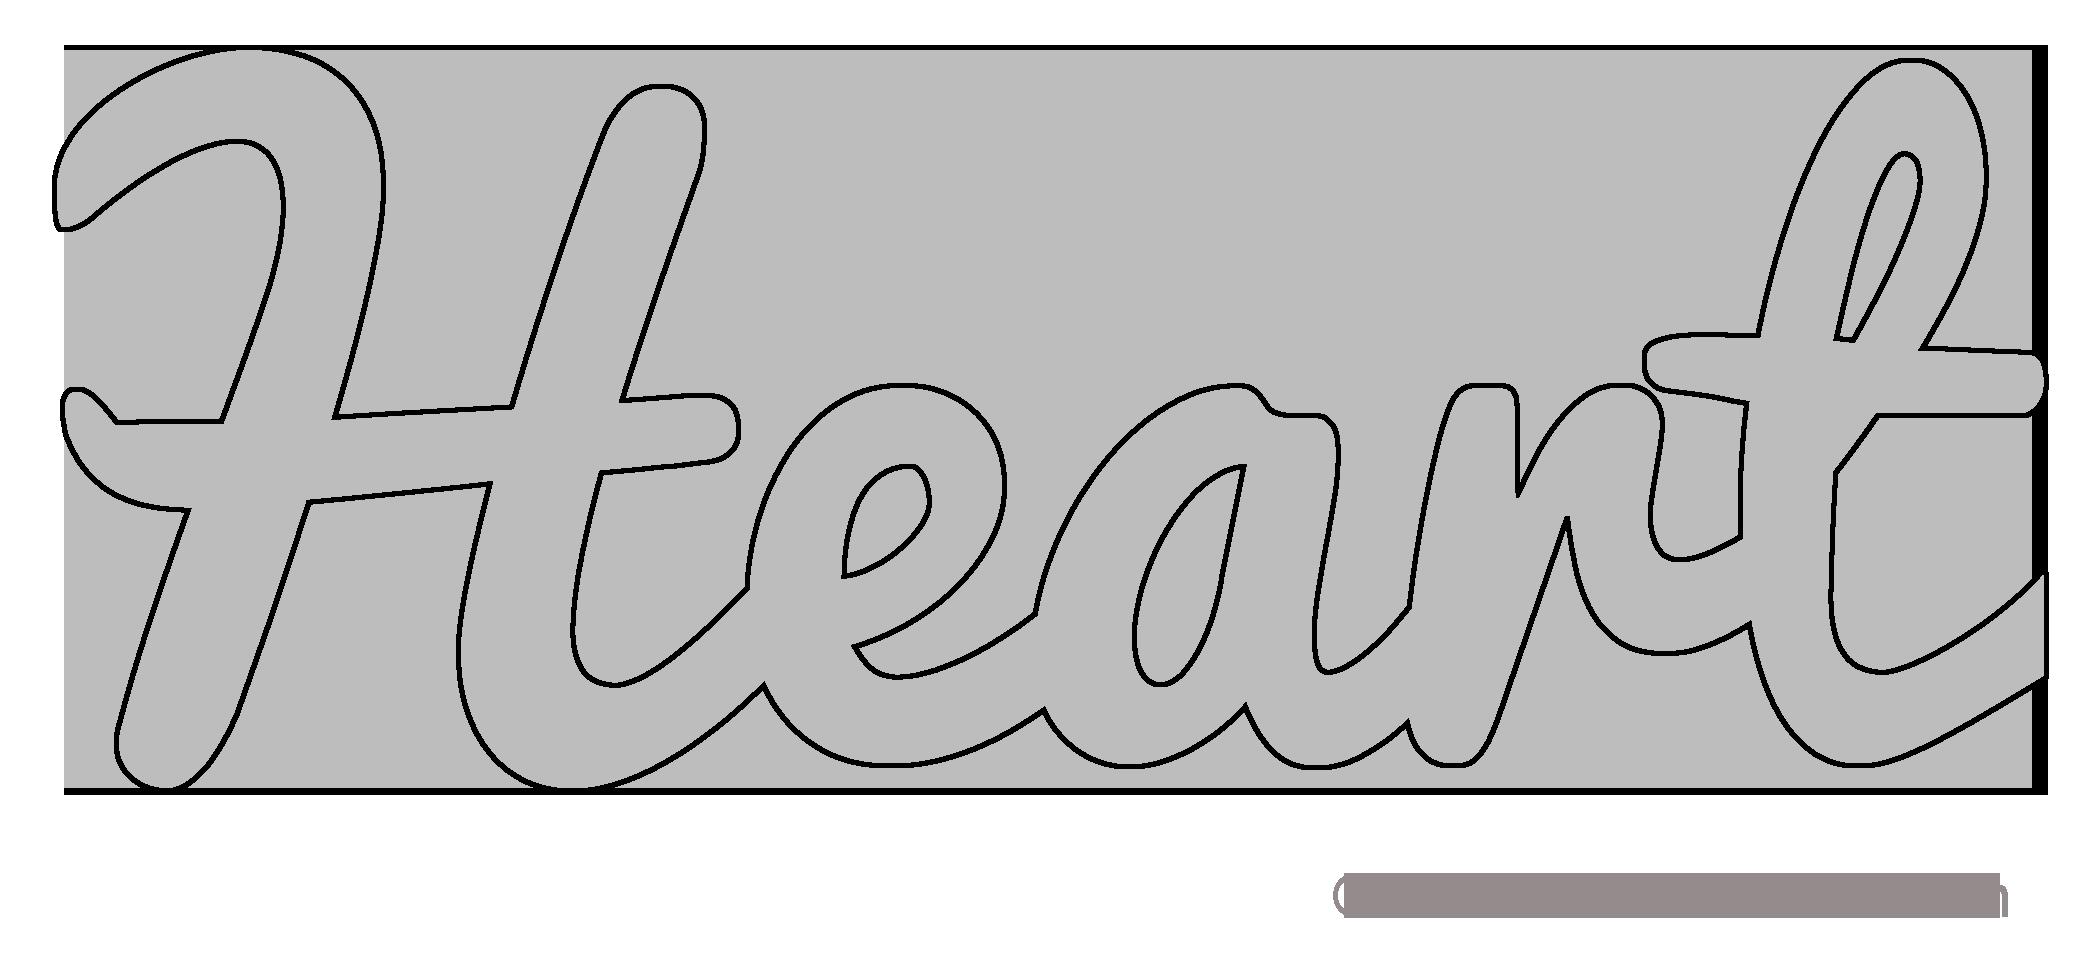 Heart Pattern Template Stencil Printable Clip Art Design Scroll Saw Pattern Word Art Downloadable Free Word Art Word Art Design Stencil Patterns